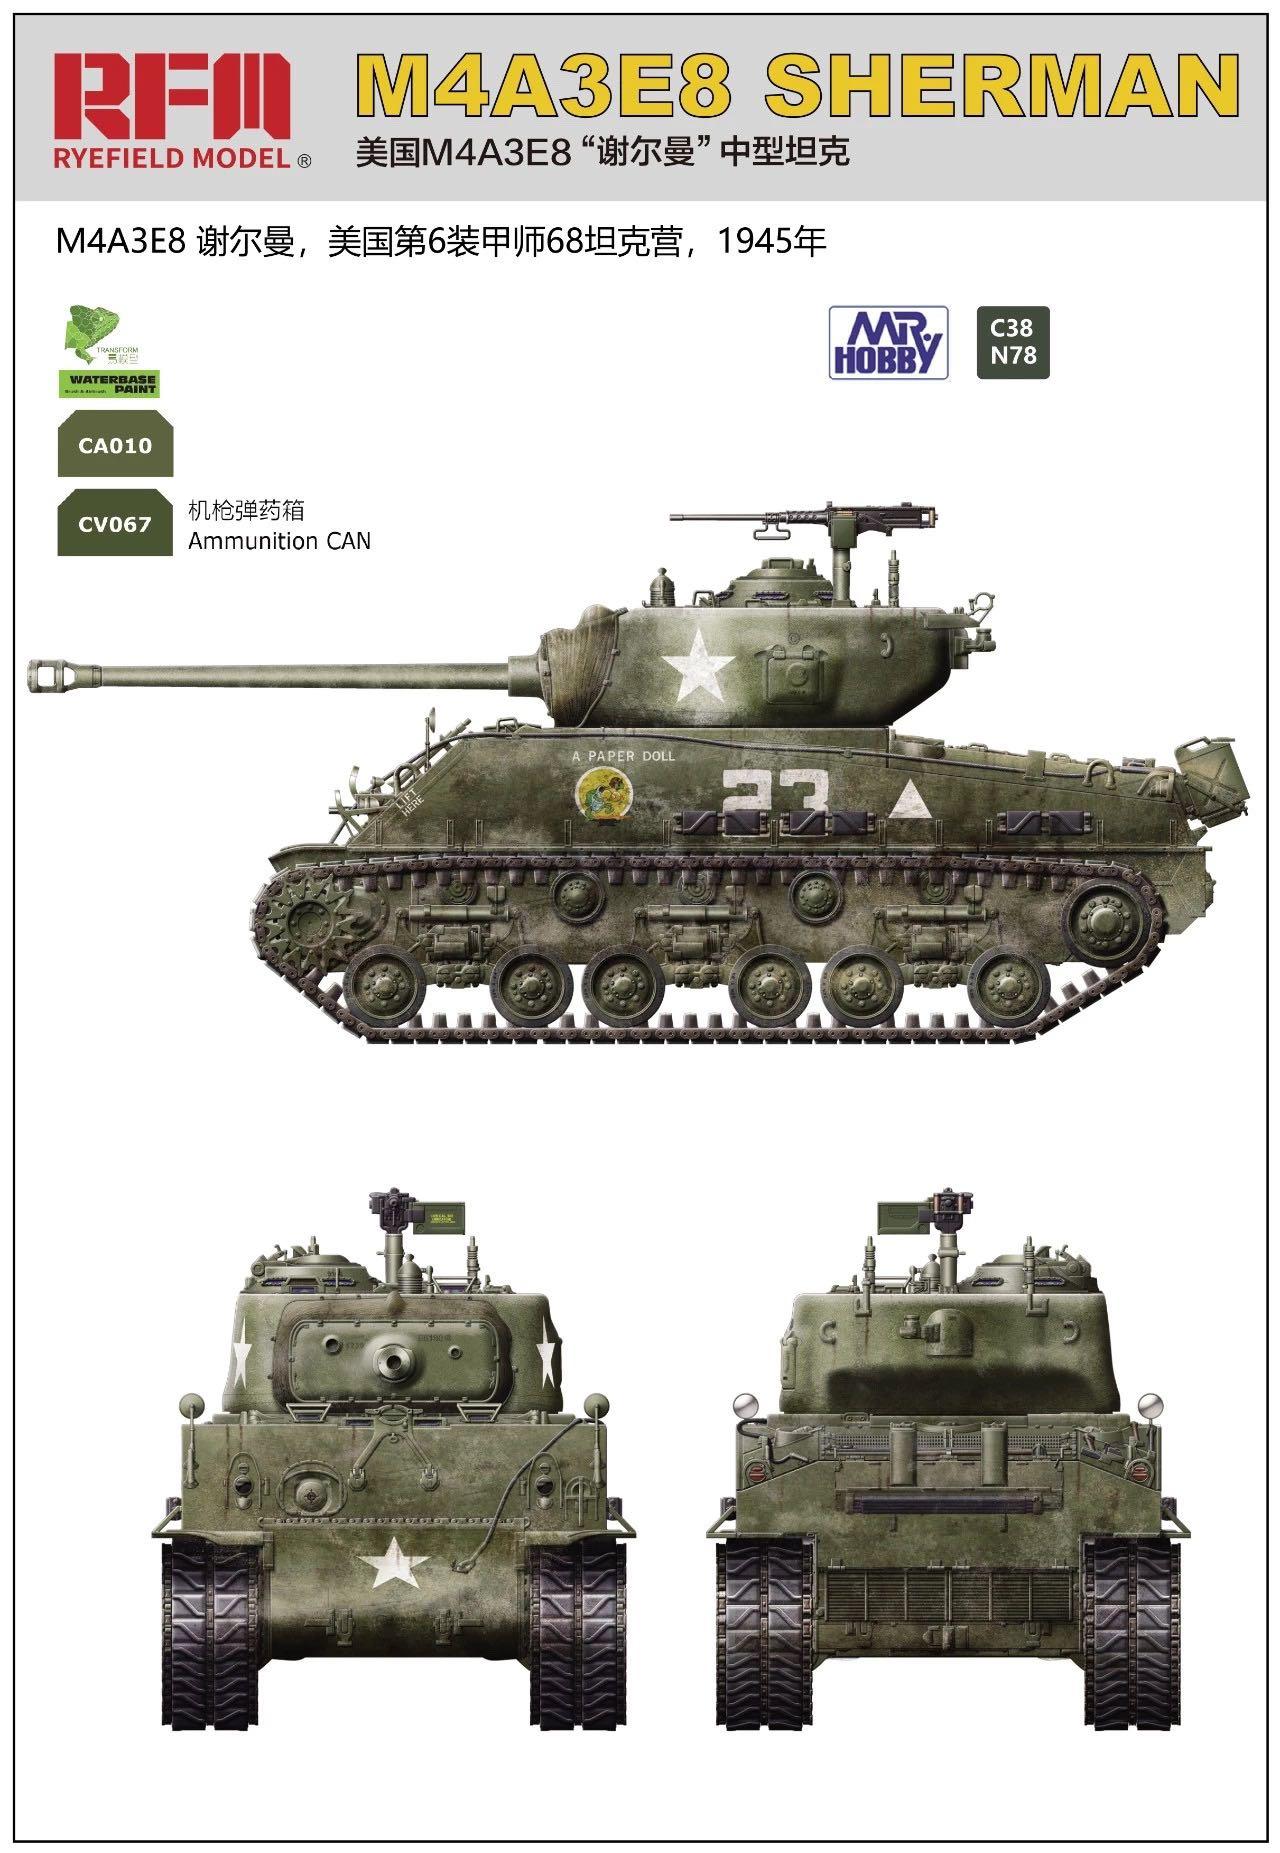 RYEFIELD MODEL # 5028 1/35 M4A3E8 SHERMAN — Hell On Wheels - AMPS